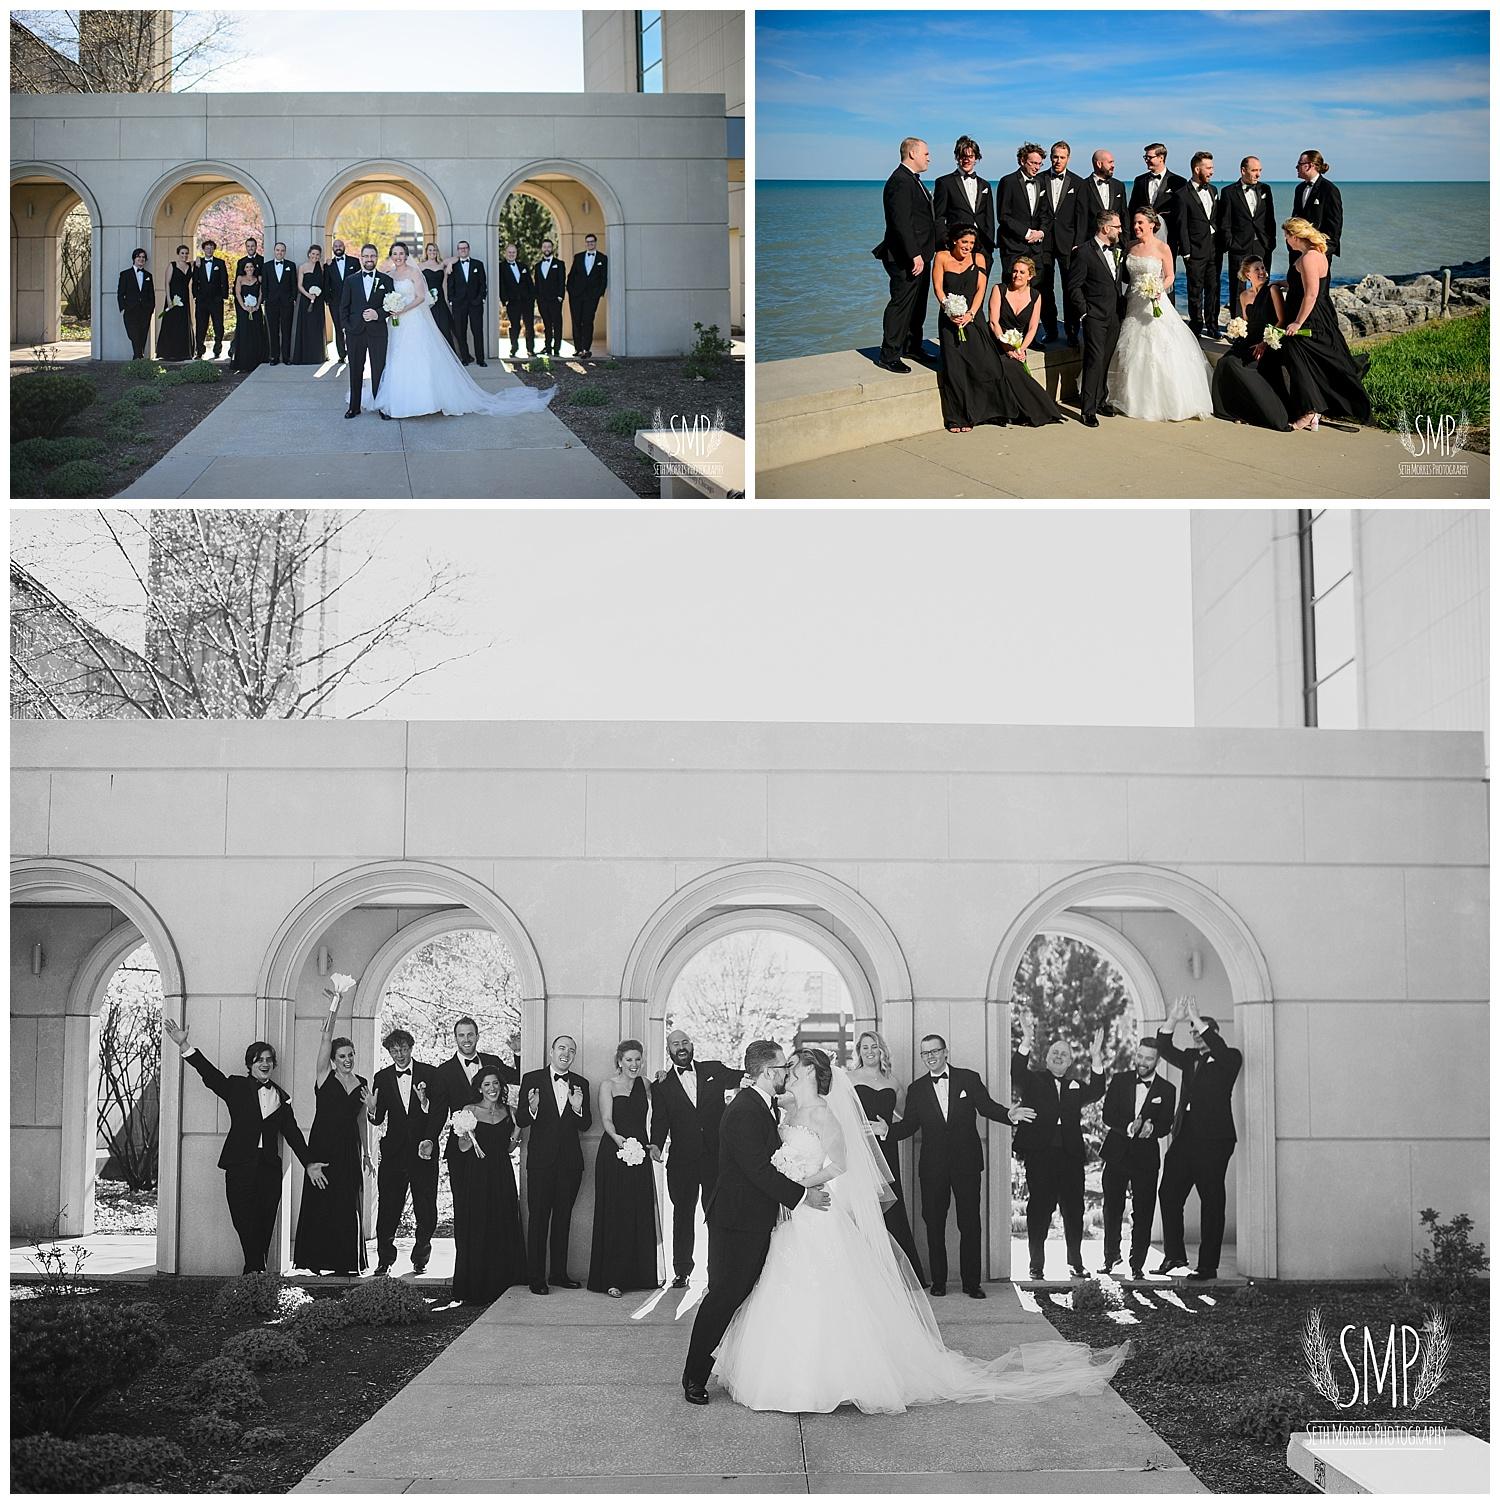 chicago-wedding-pictures-del-strada-hotel-allegro-60.jpg